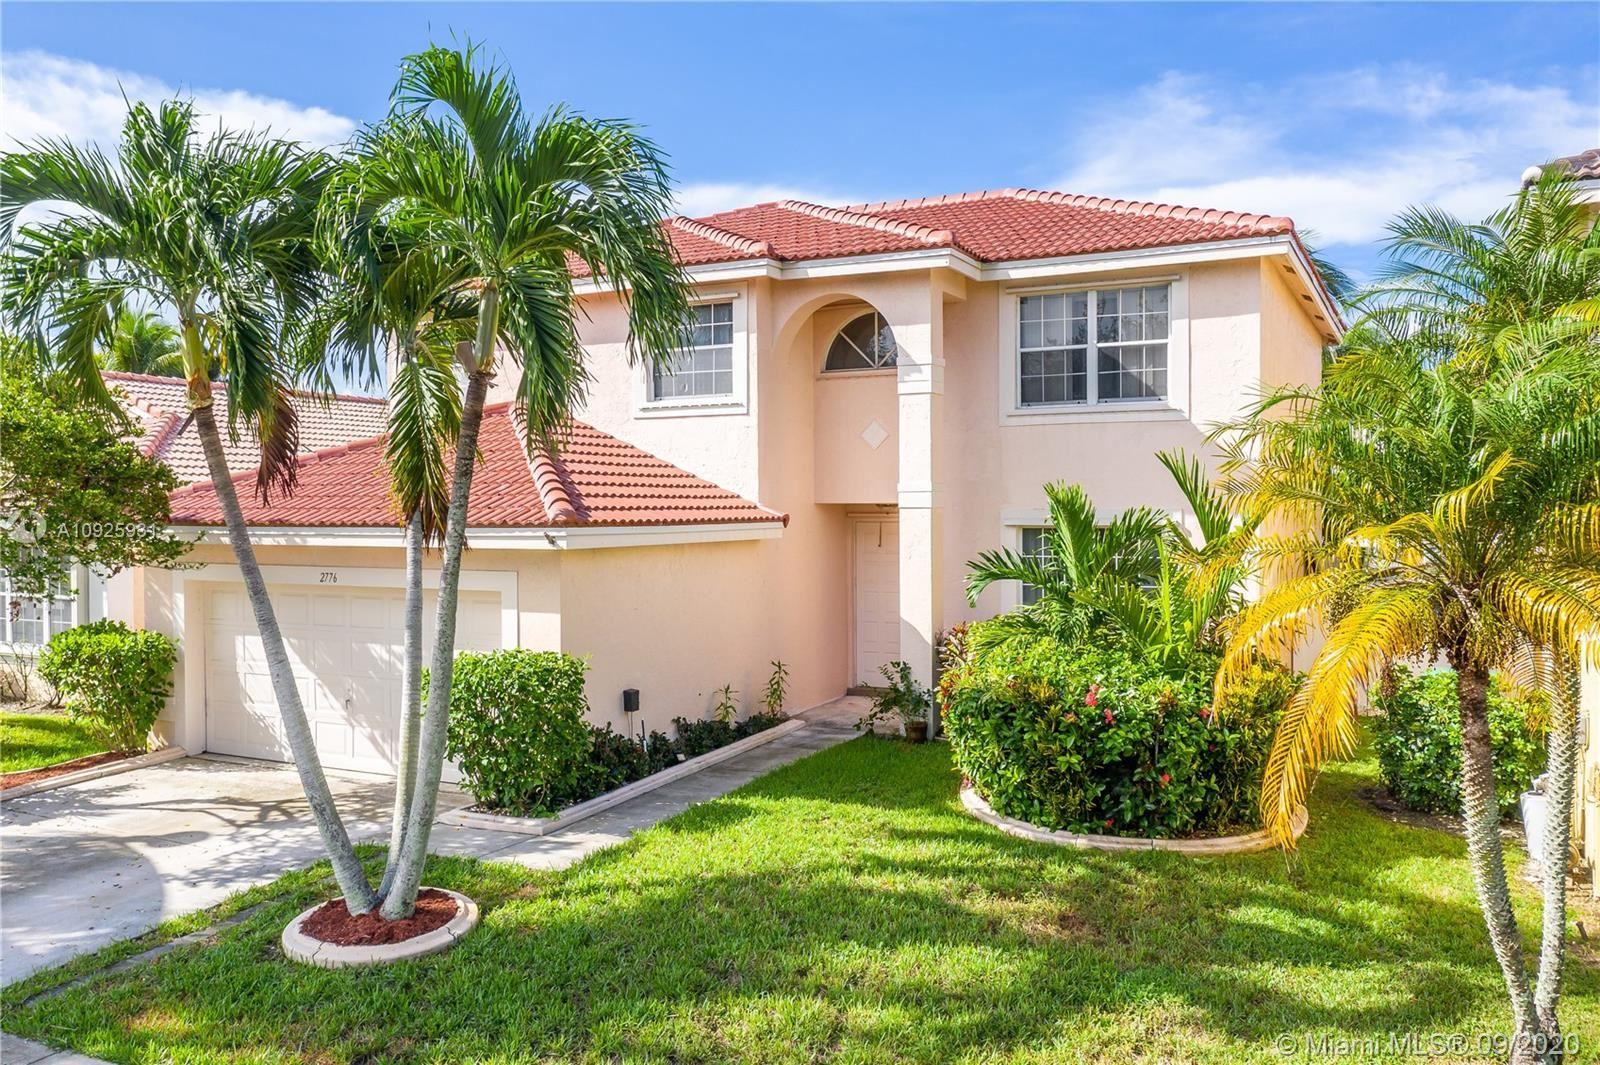 Photo of 2776 SW 180th Ave, Miramar, FL 33029 (MLS # A10925931)